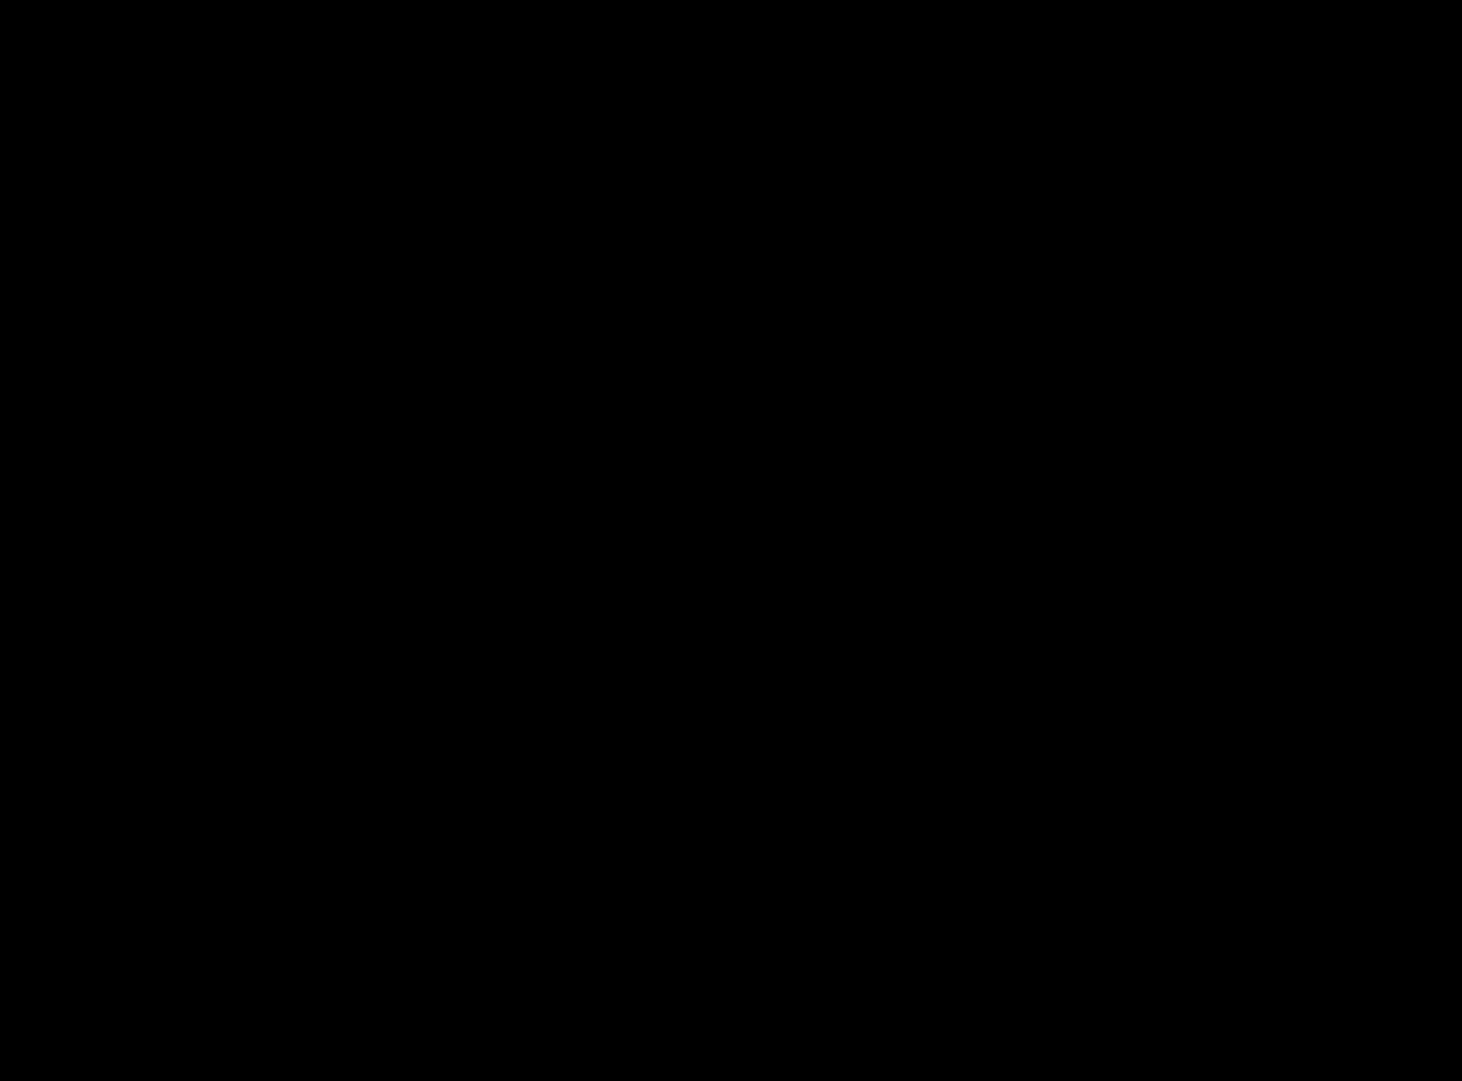 Hand Emoji Clipart Discord - Discord Light Theme Meme - Png